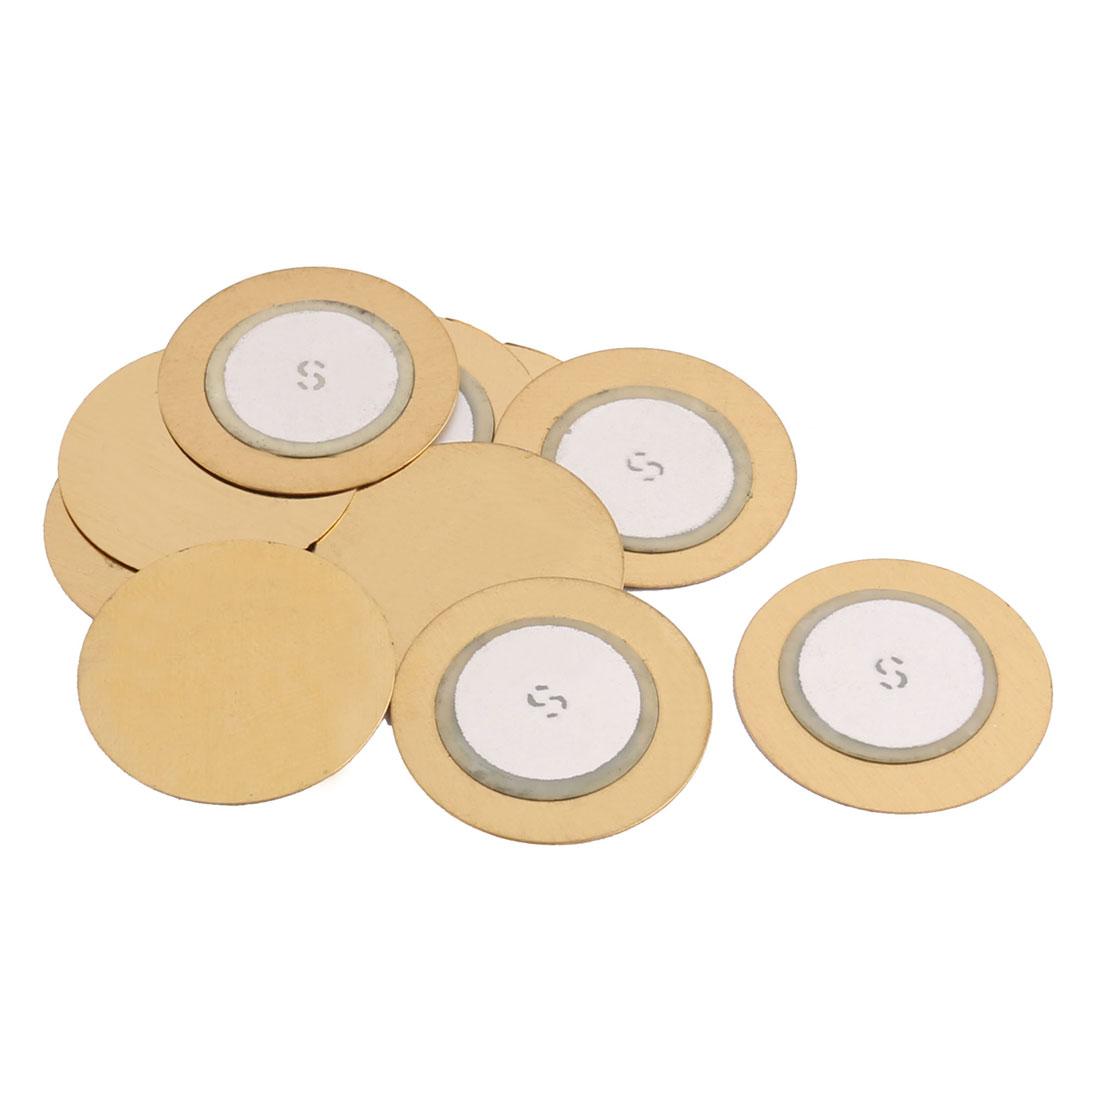 10Pcs 20mm Diameter Piezo Discs Piezoelectric Ceramic Copper Buzzer Film Gasket